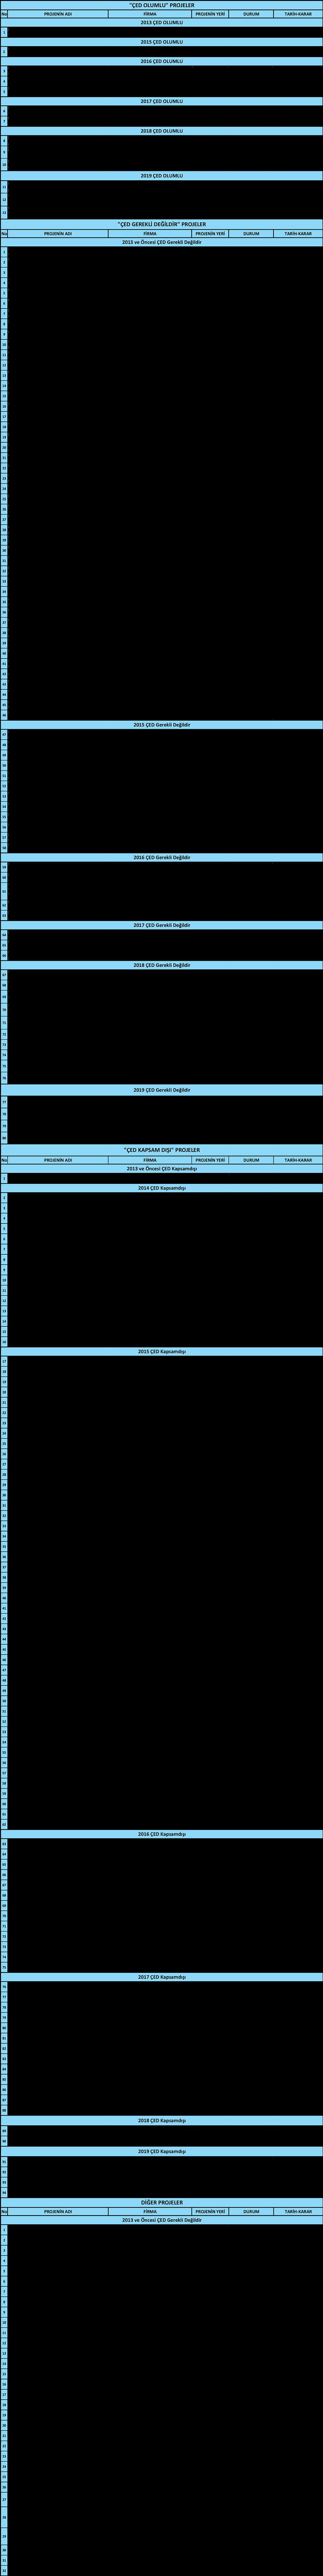 DE_Planlama_ÇED_Referanslar_15.04.png